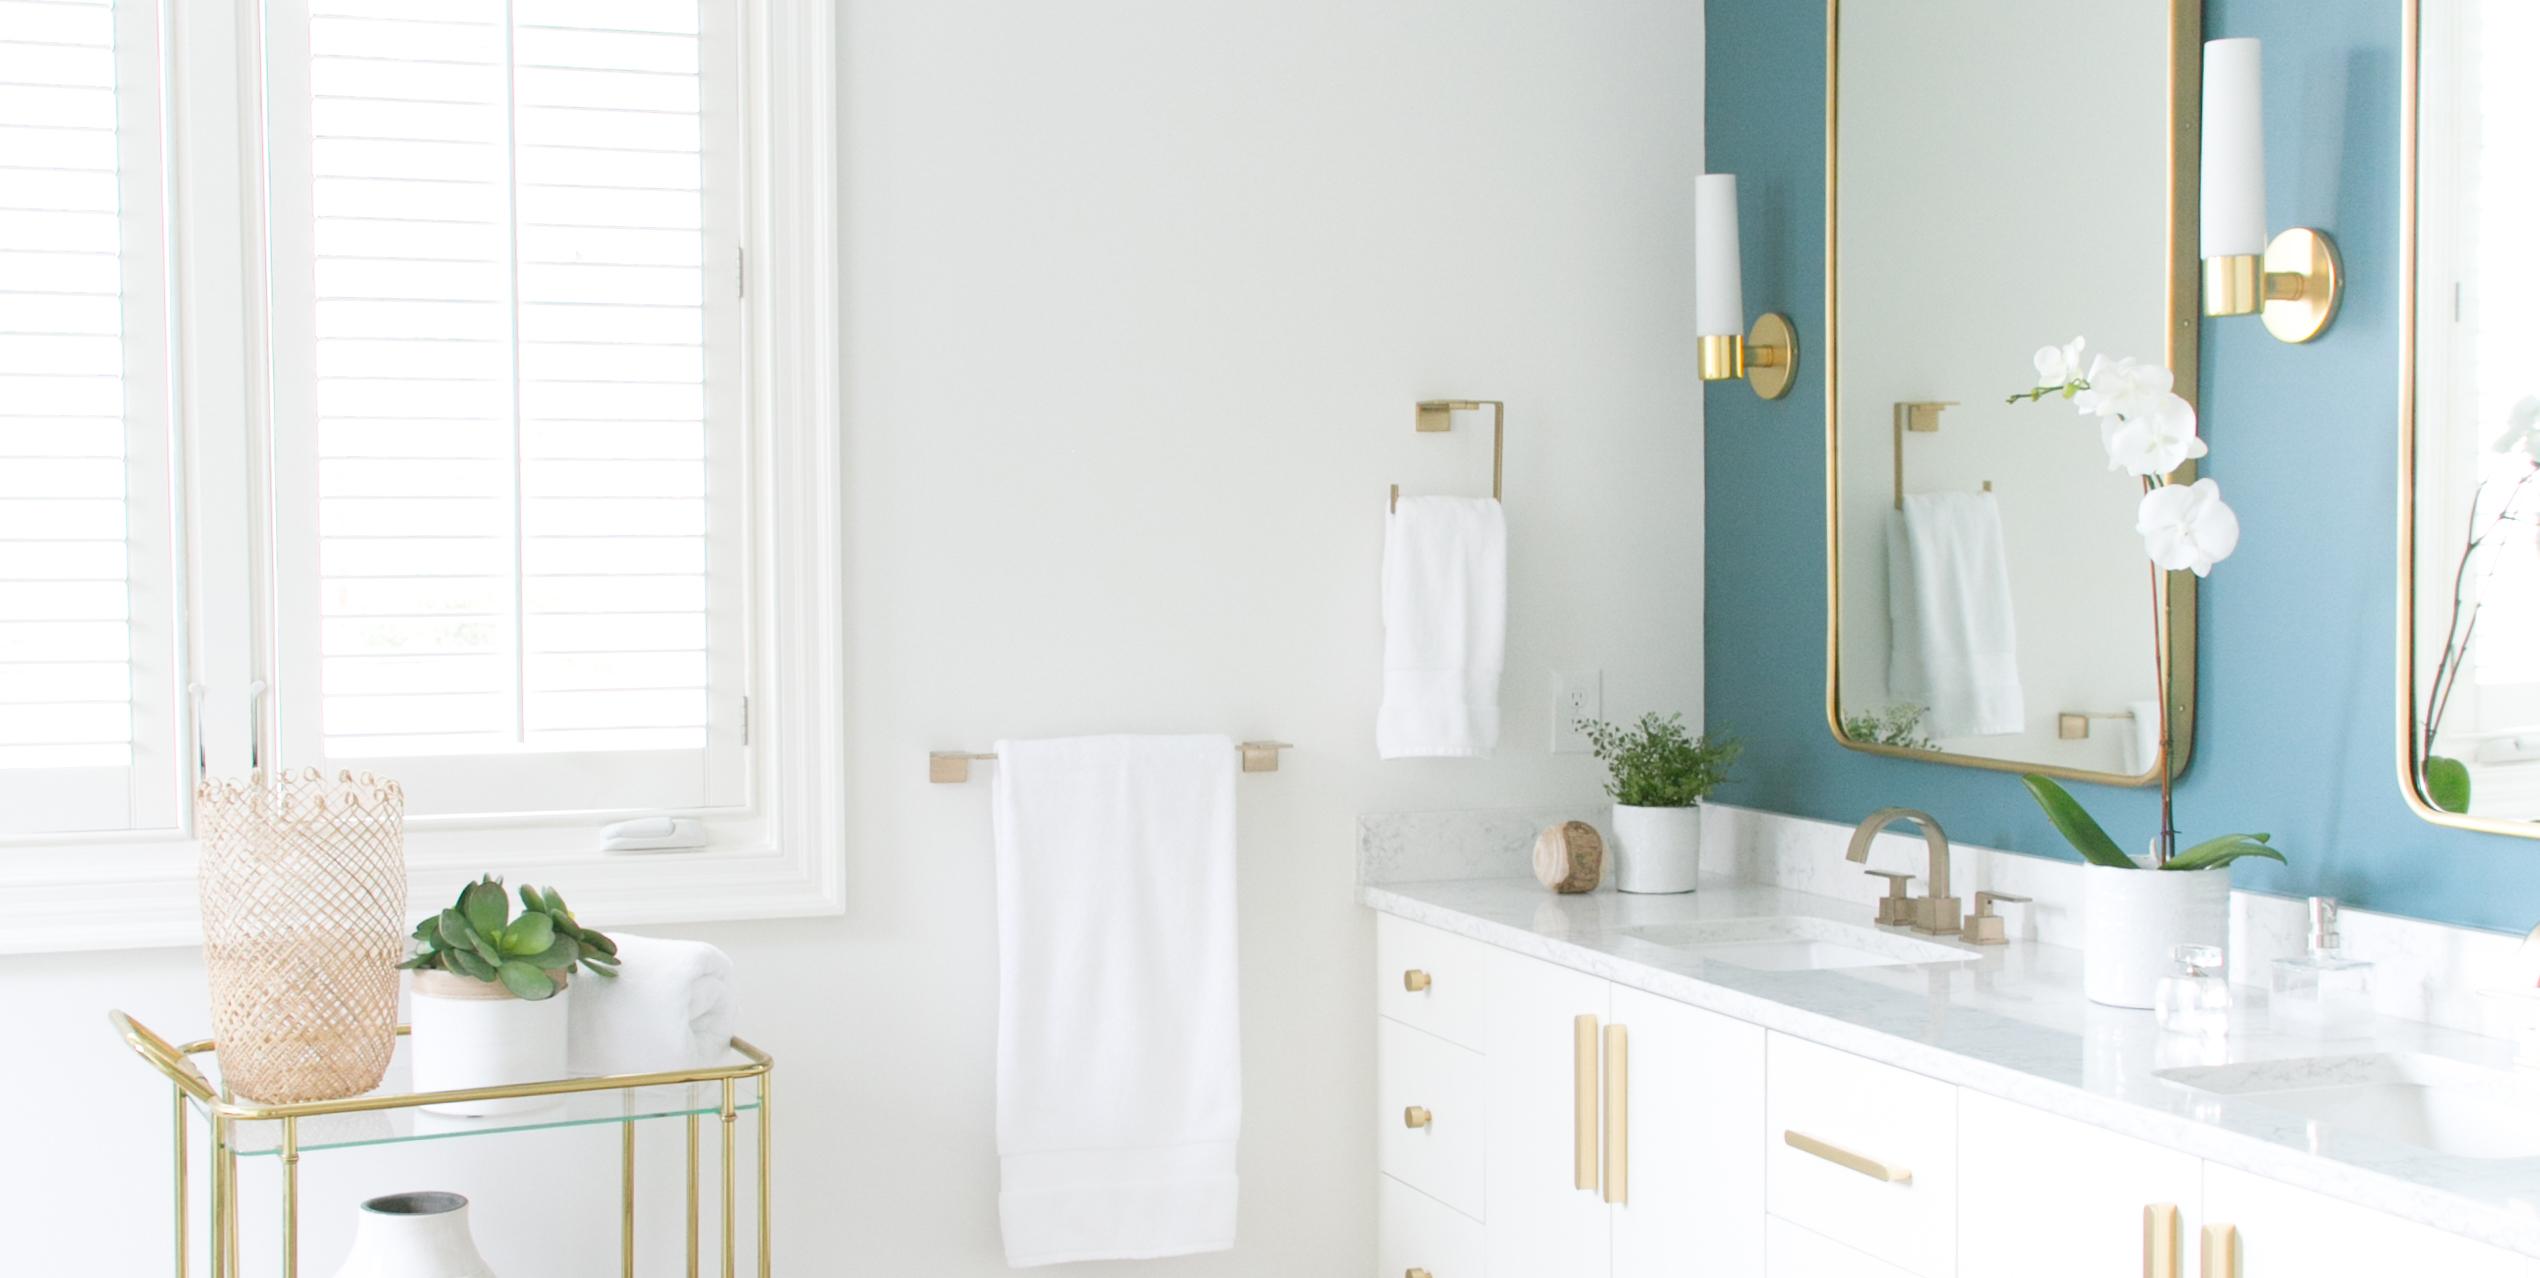 Sims Vine Bathroom